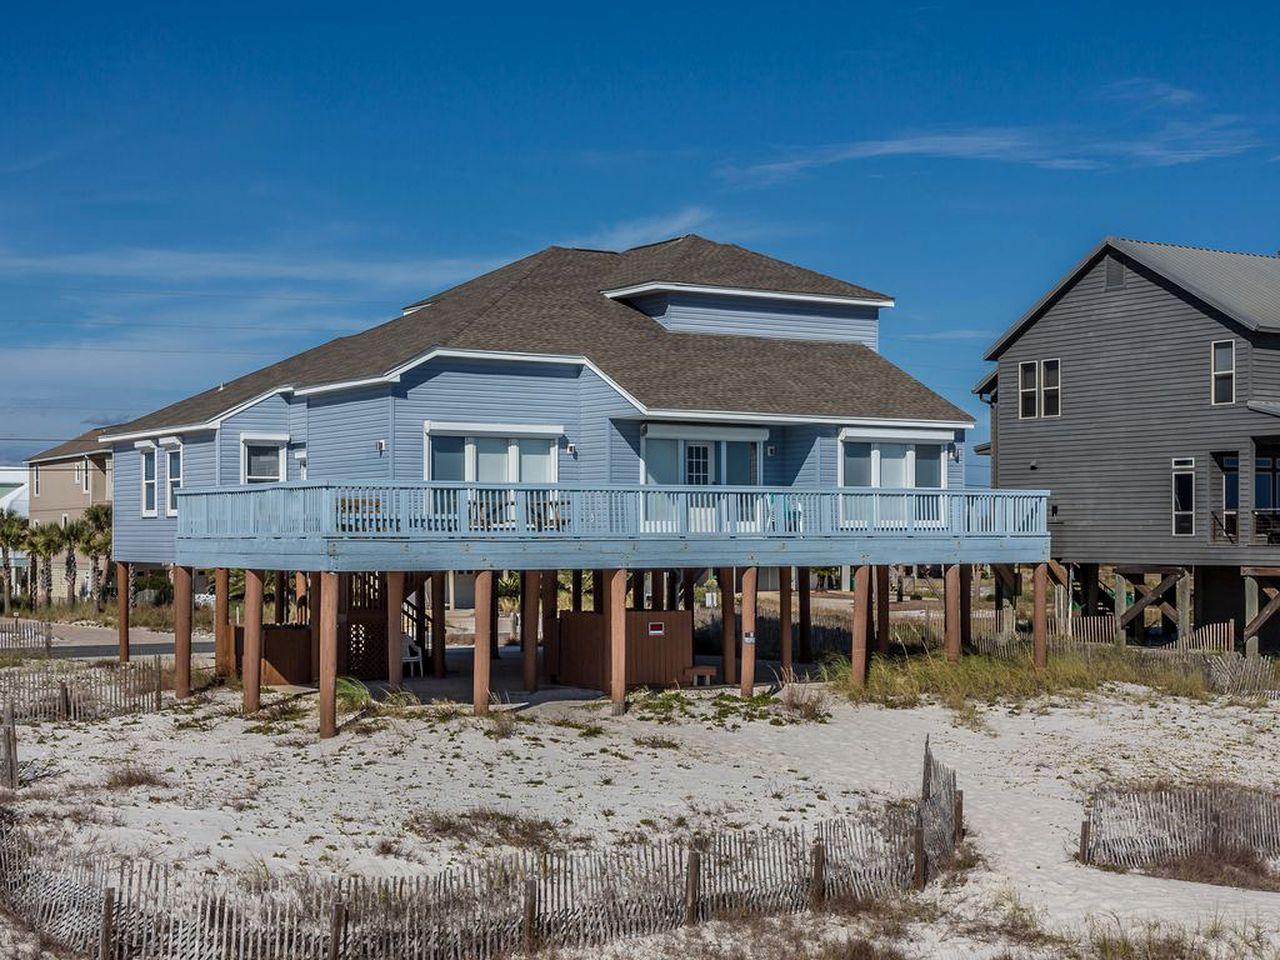 Beach Cabin Rental in Navarre, Florida